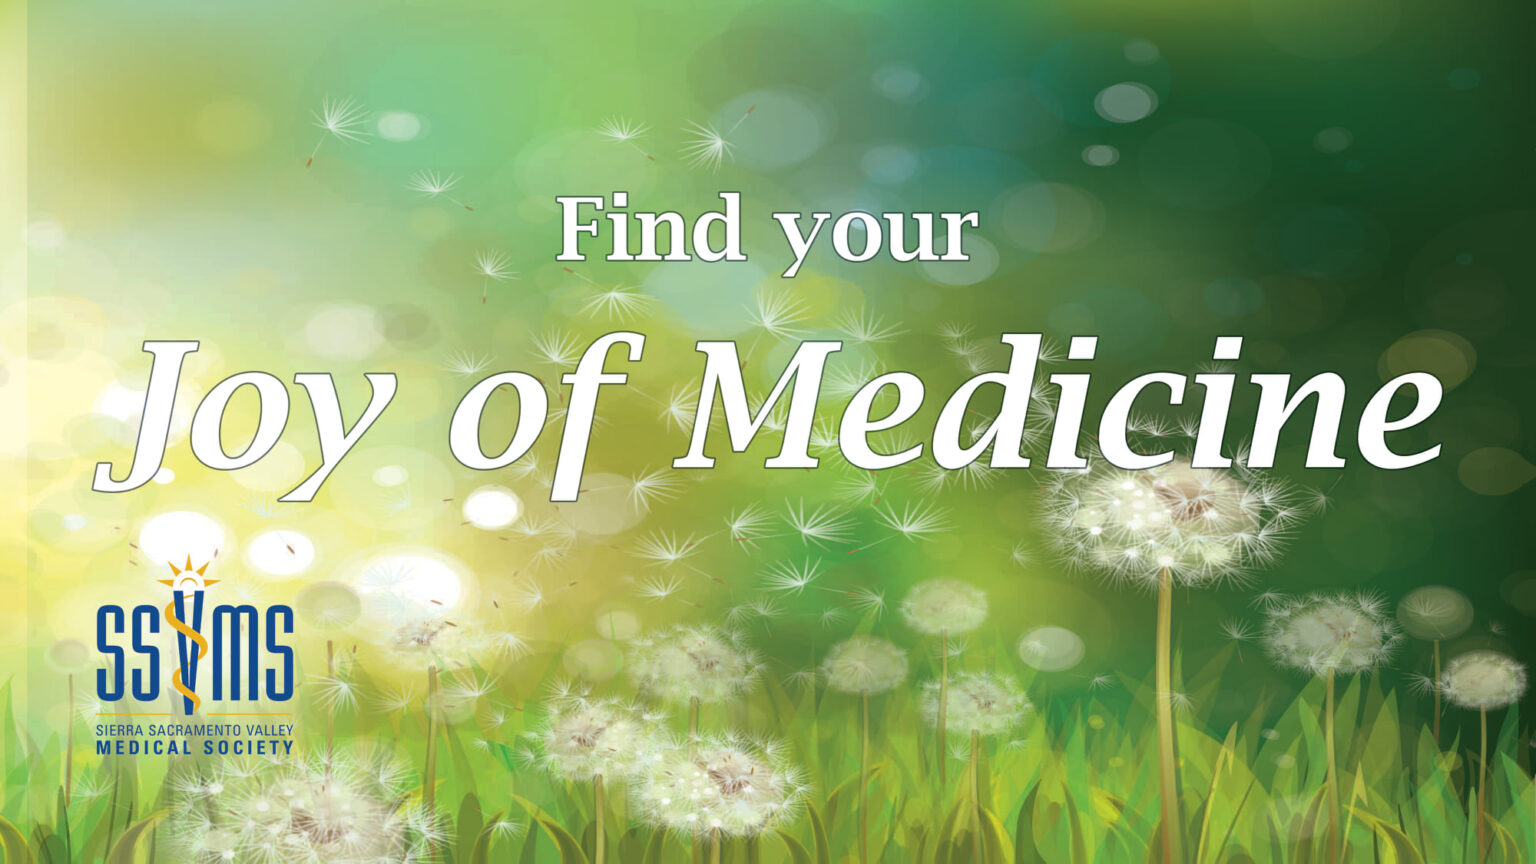 Joy of Medicine banner with SSVMS logo in the bottom left corner